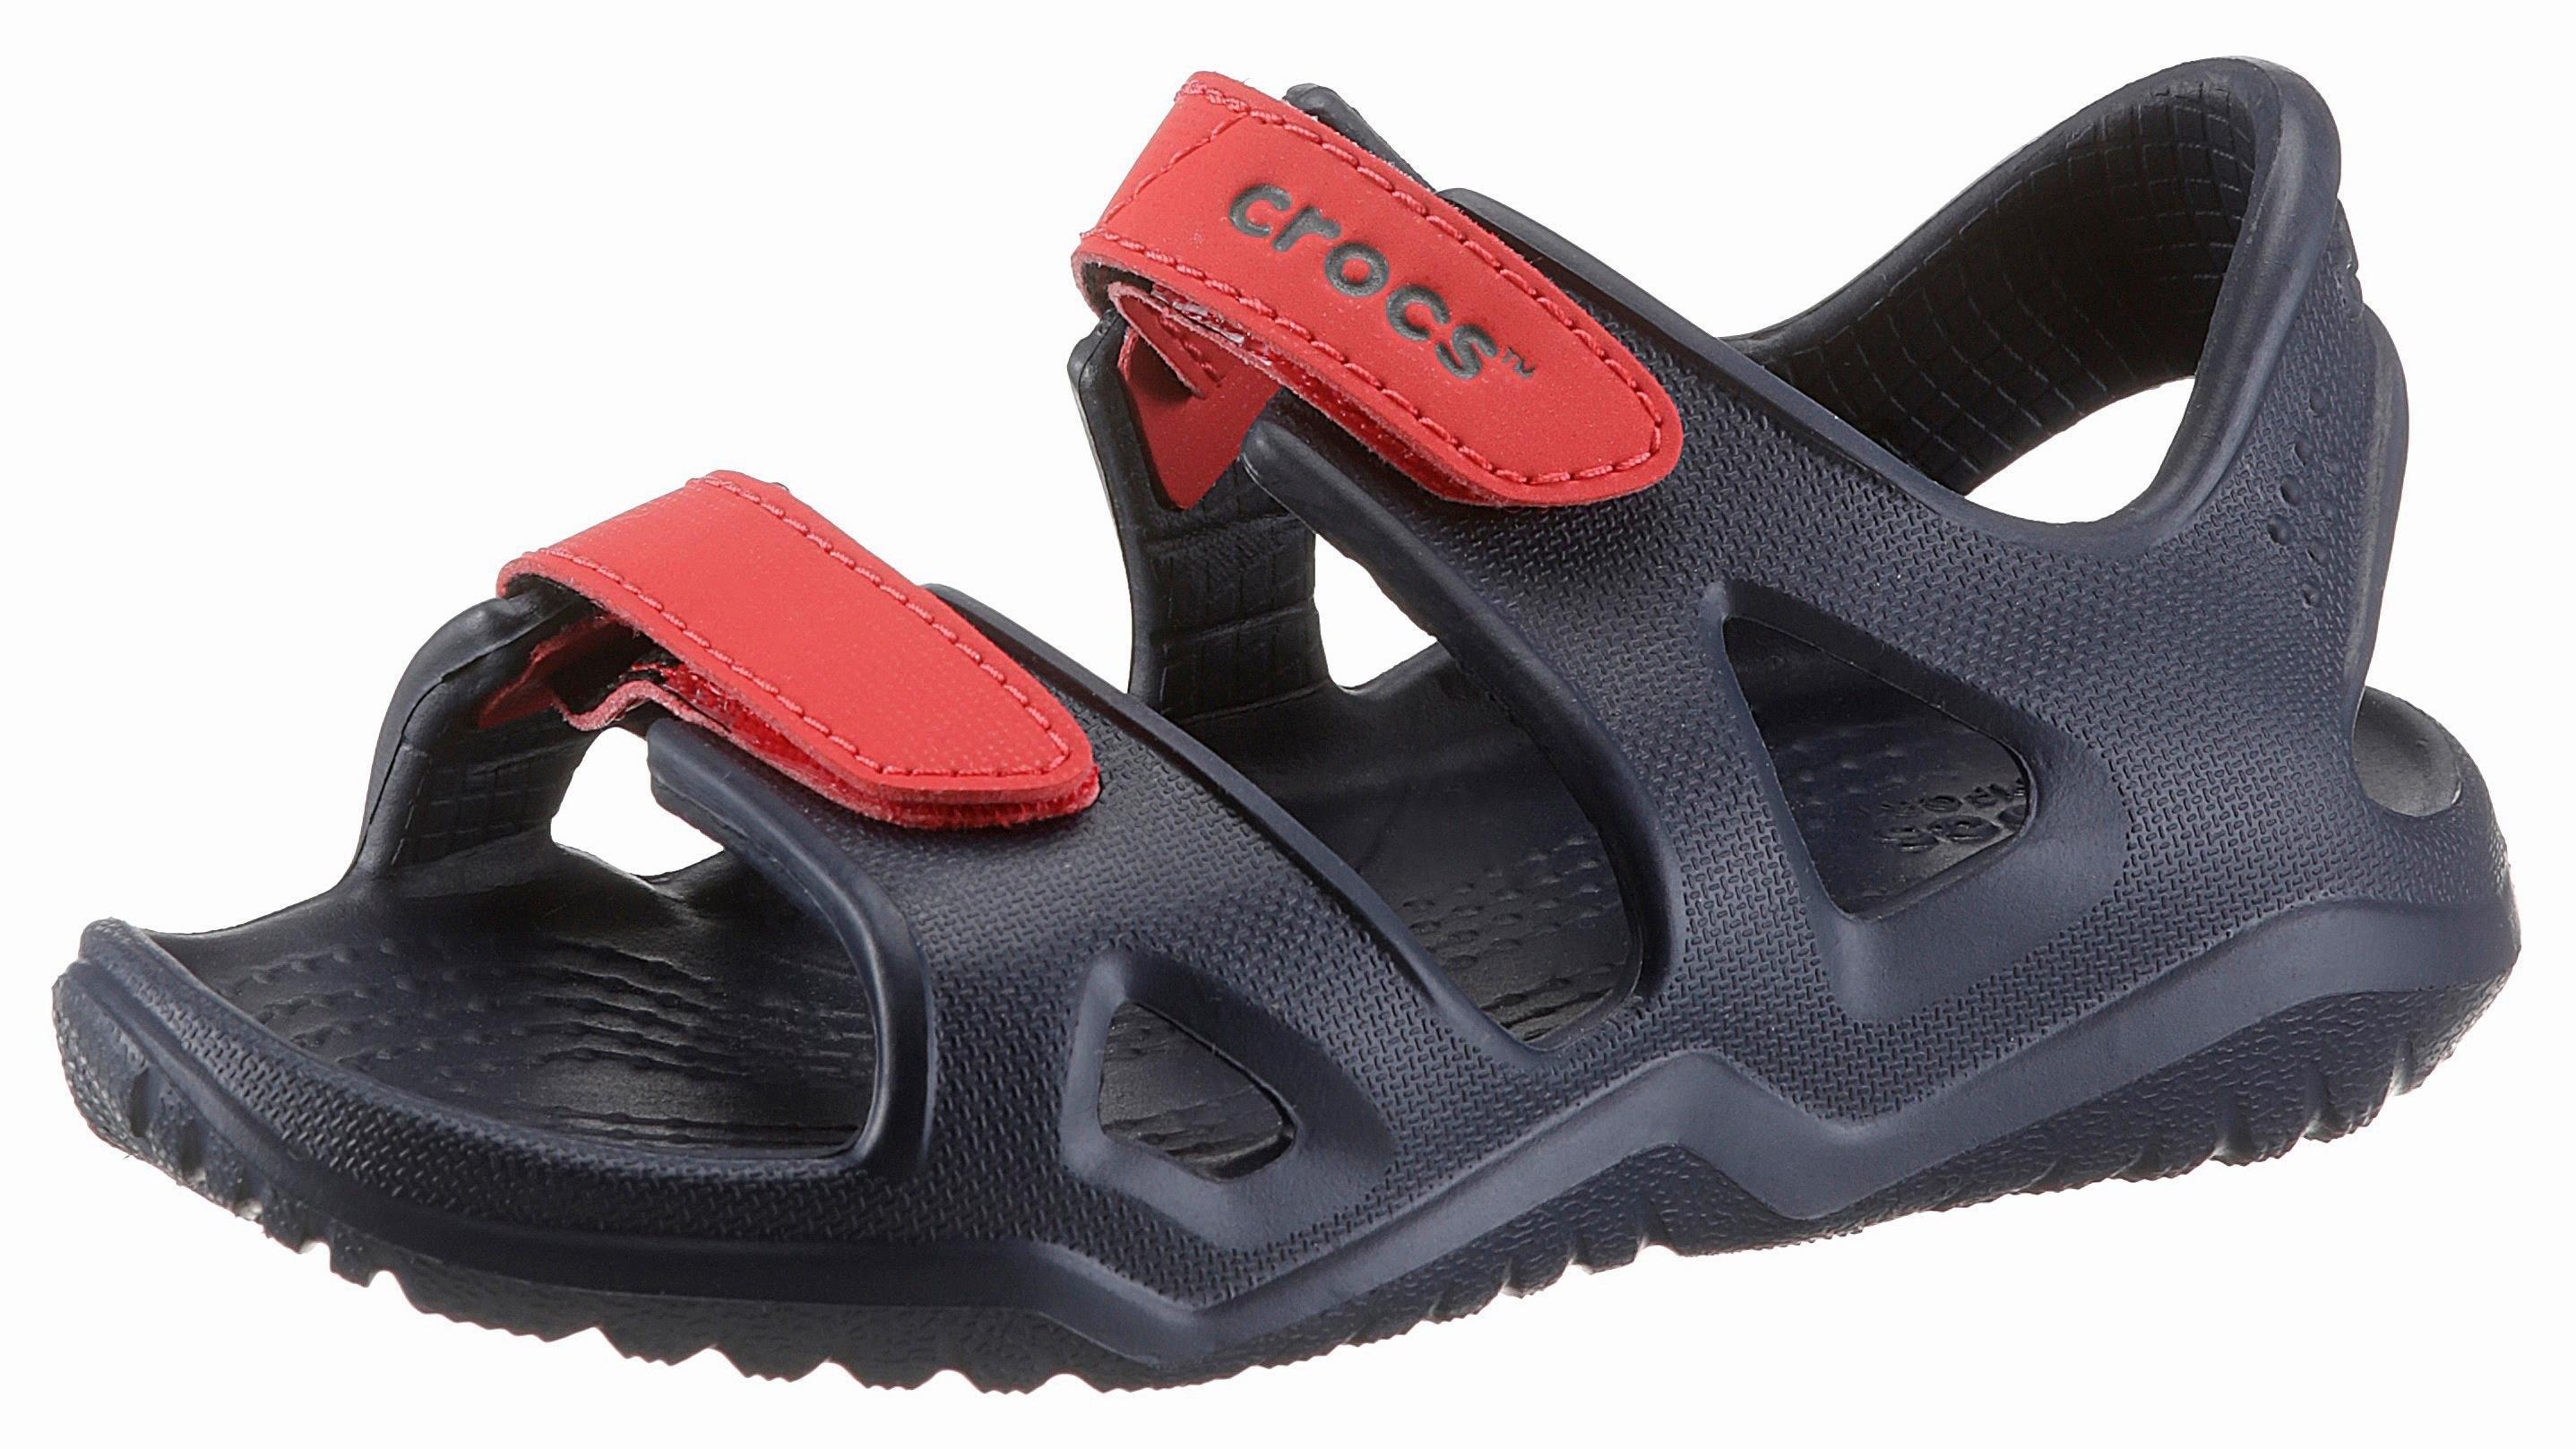 Crocs sandalen »Swiftwater River Sandal« veilig op otto.nl kopen